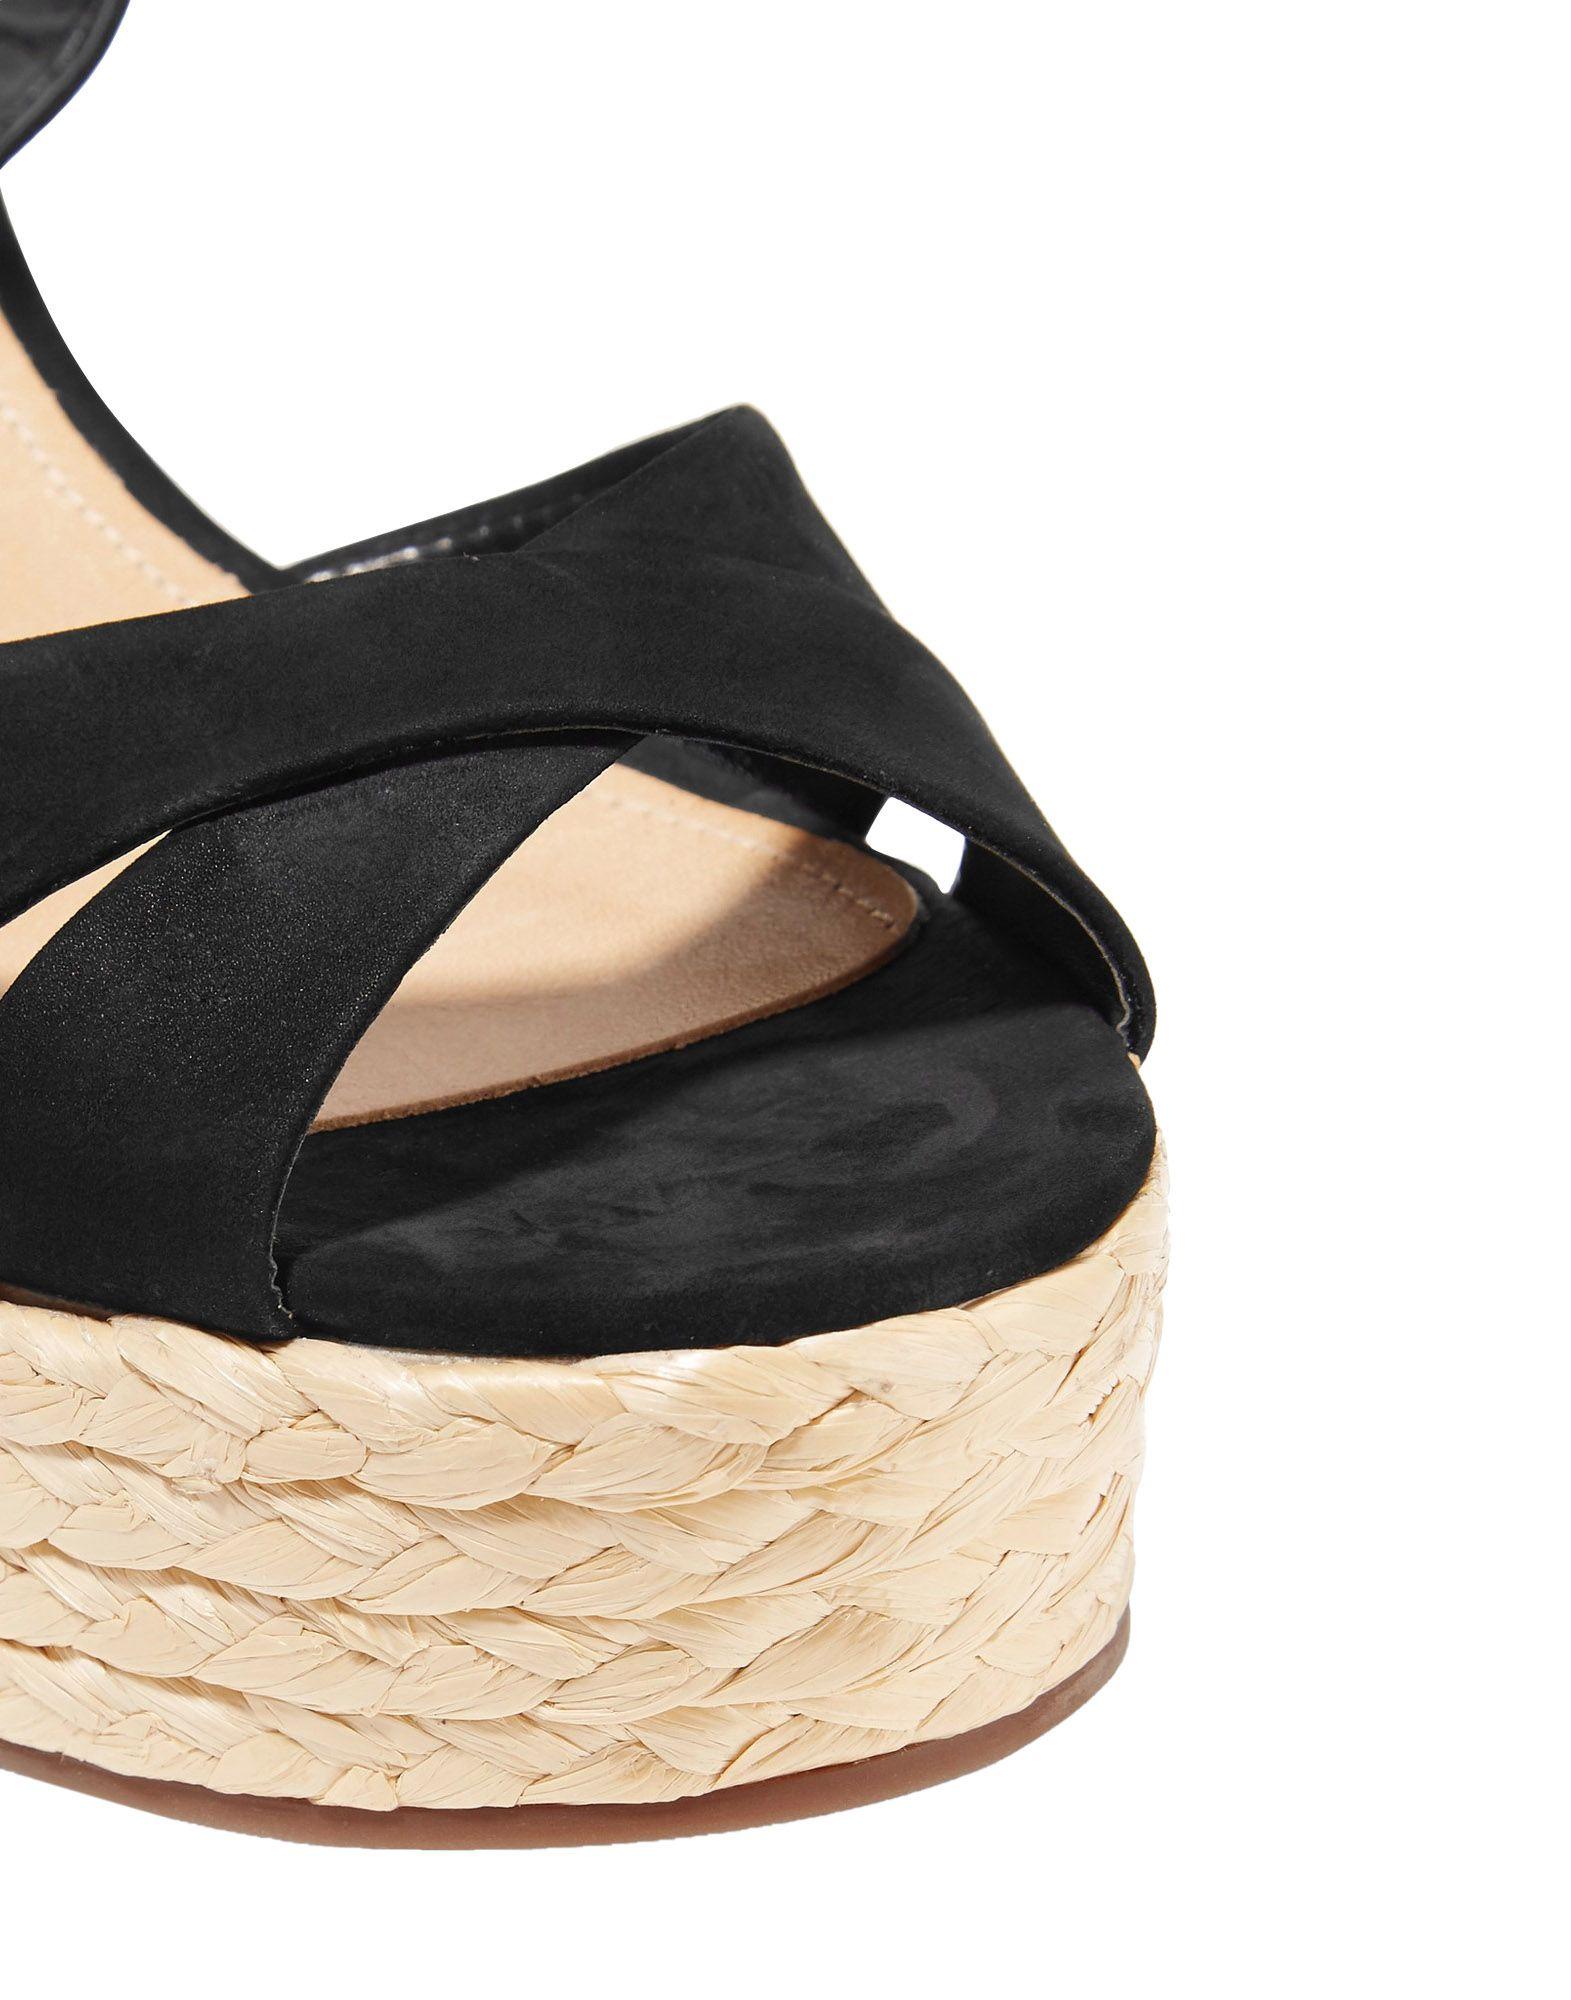 Schutz Sandalen Qualität Damen  11515422NI Gute Qualität Sandalen beliebte Schuhe e281ee